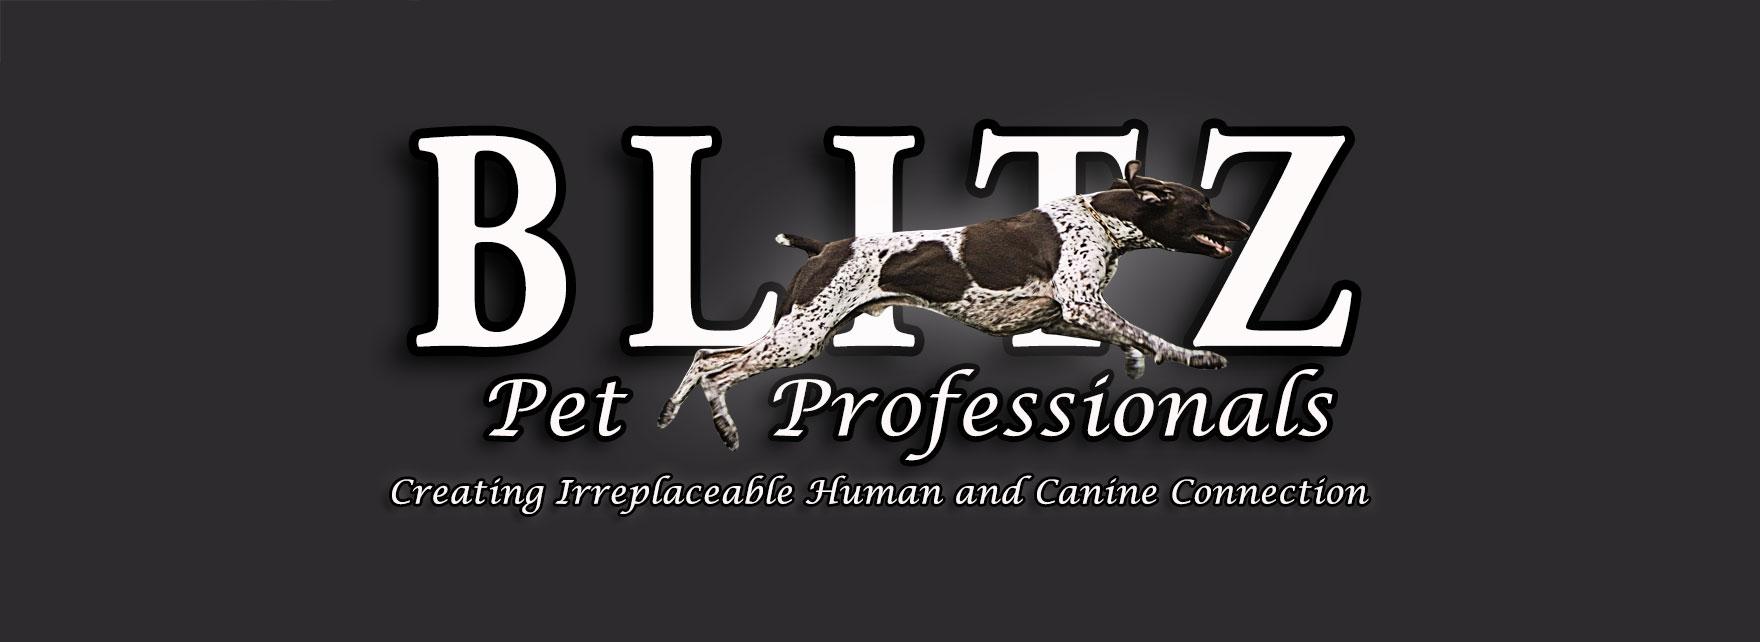 Blitz pet Pros banner